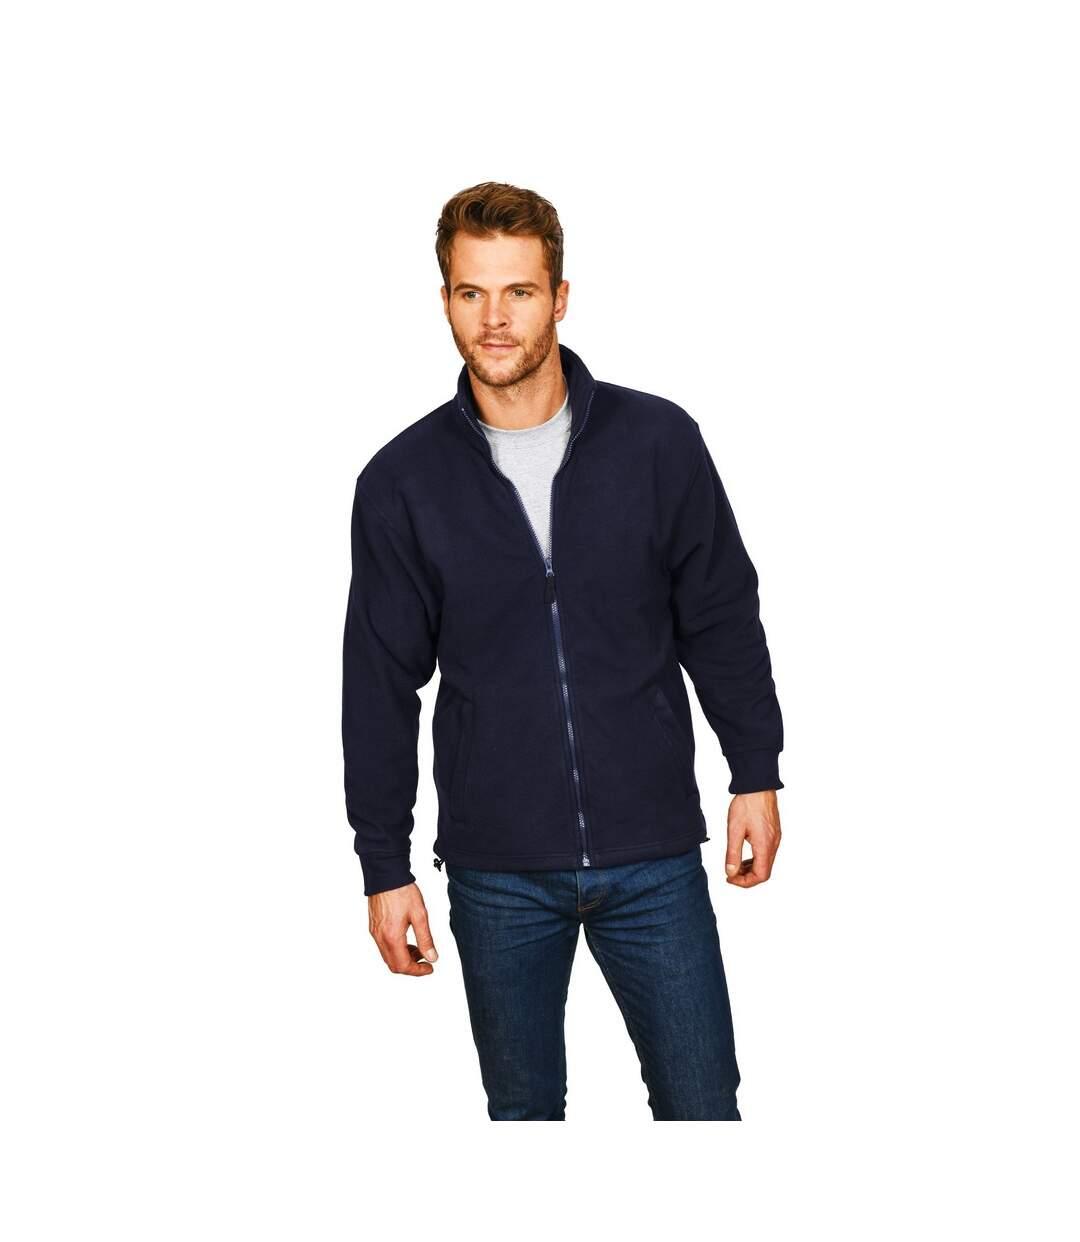 Absolute Apparel Mens Brumal Full Zip Fleece (Black) - UTAB131